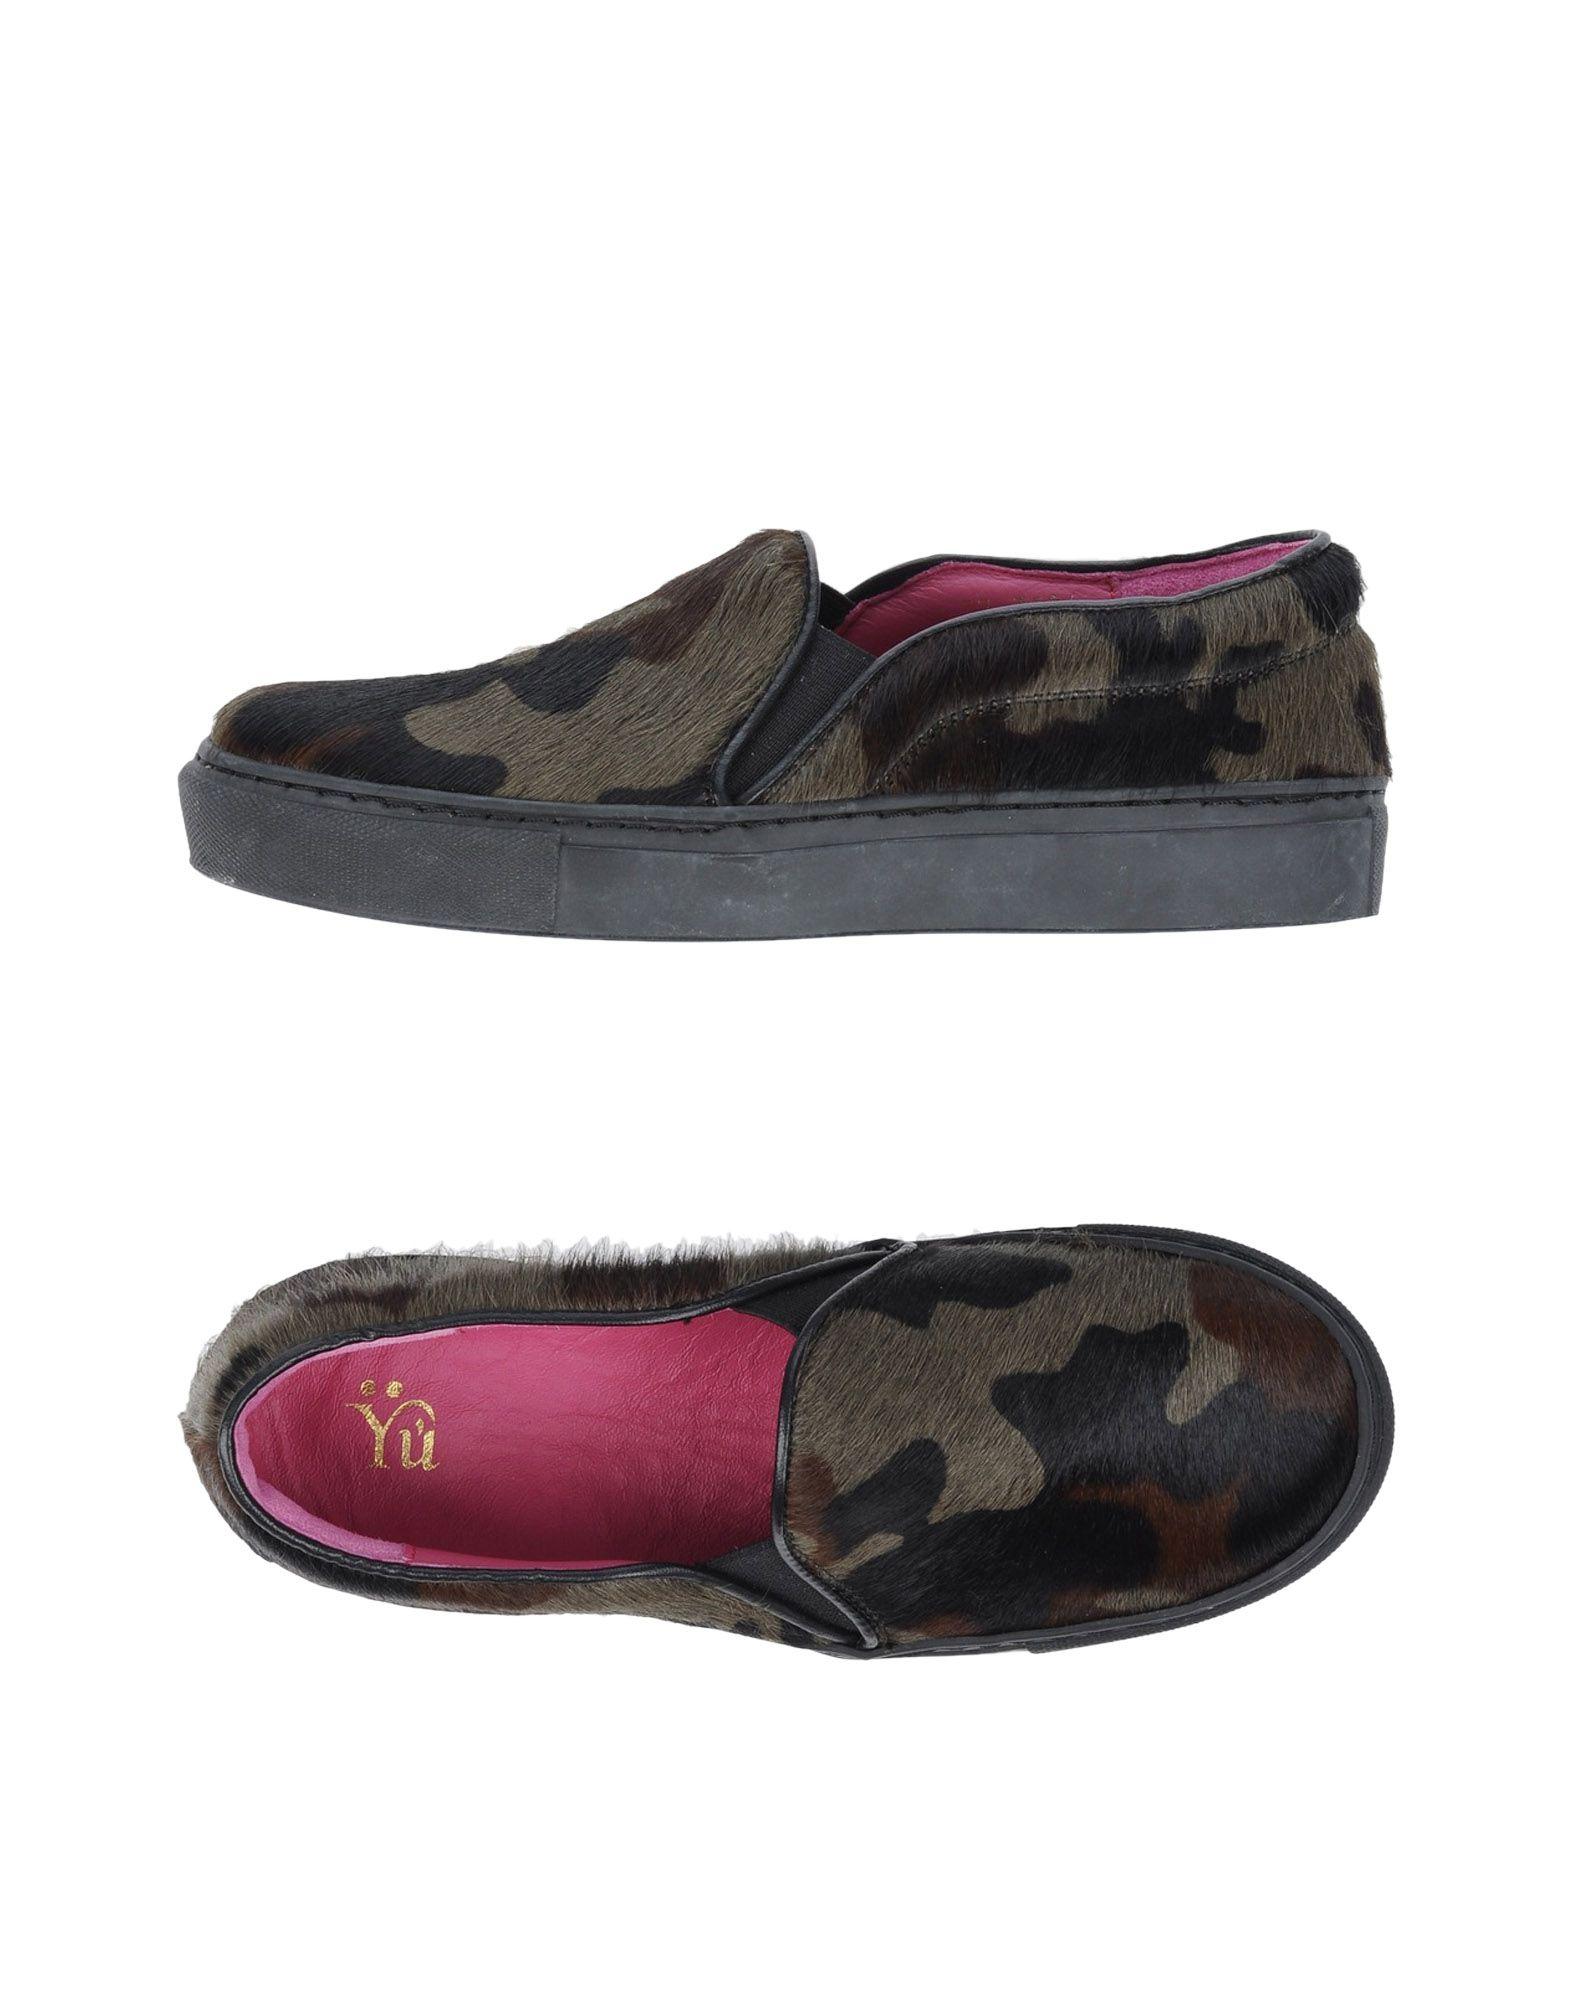 Ÿù Sneakers United - Women Ÿù Sneakers online on  United Sneakers Kingdom - 11275619RW d0ffcc